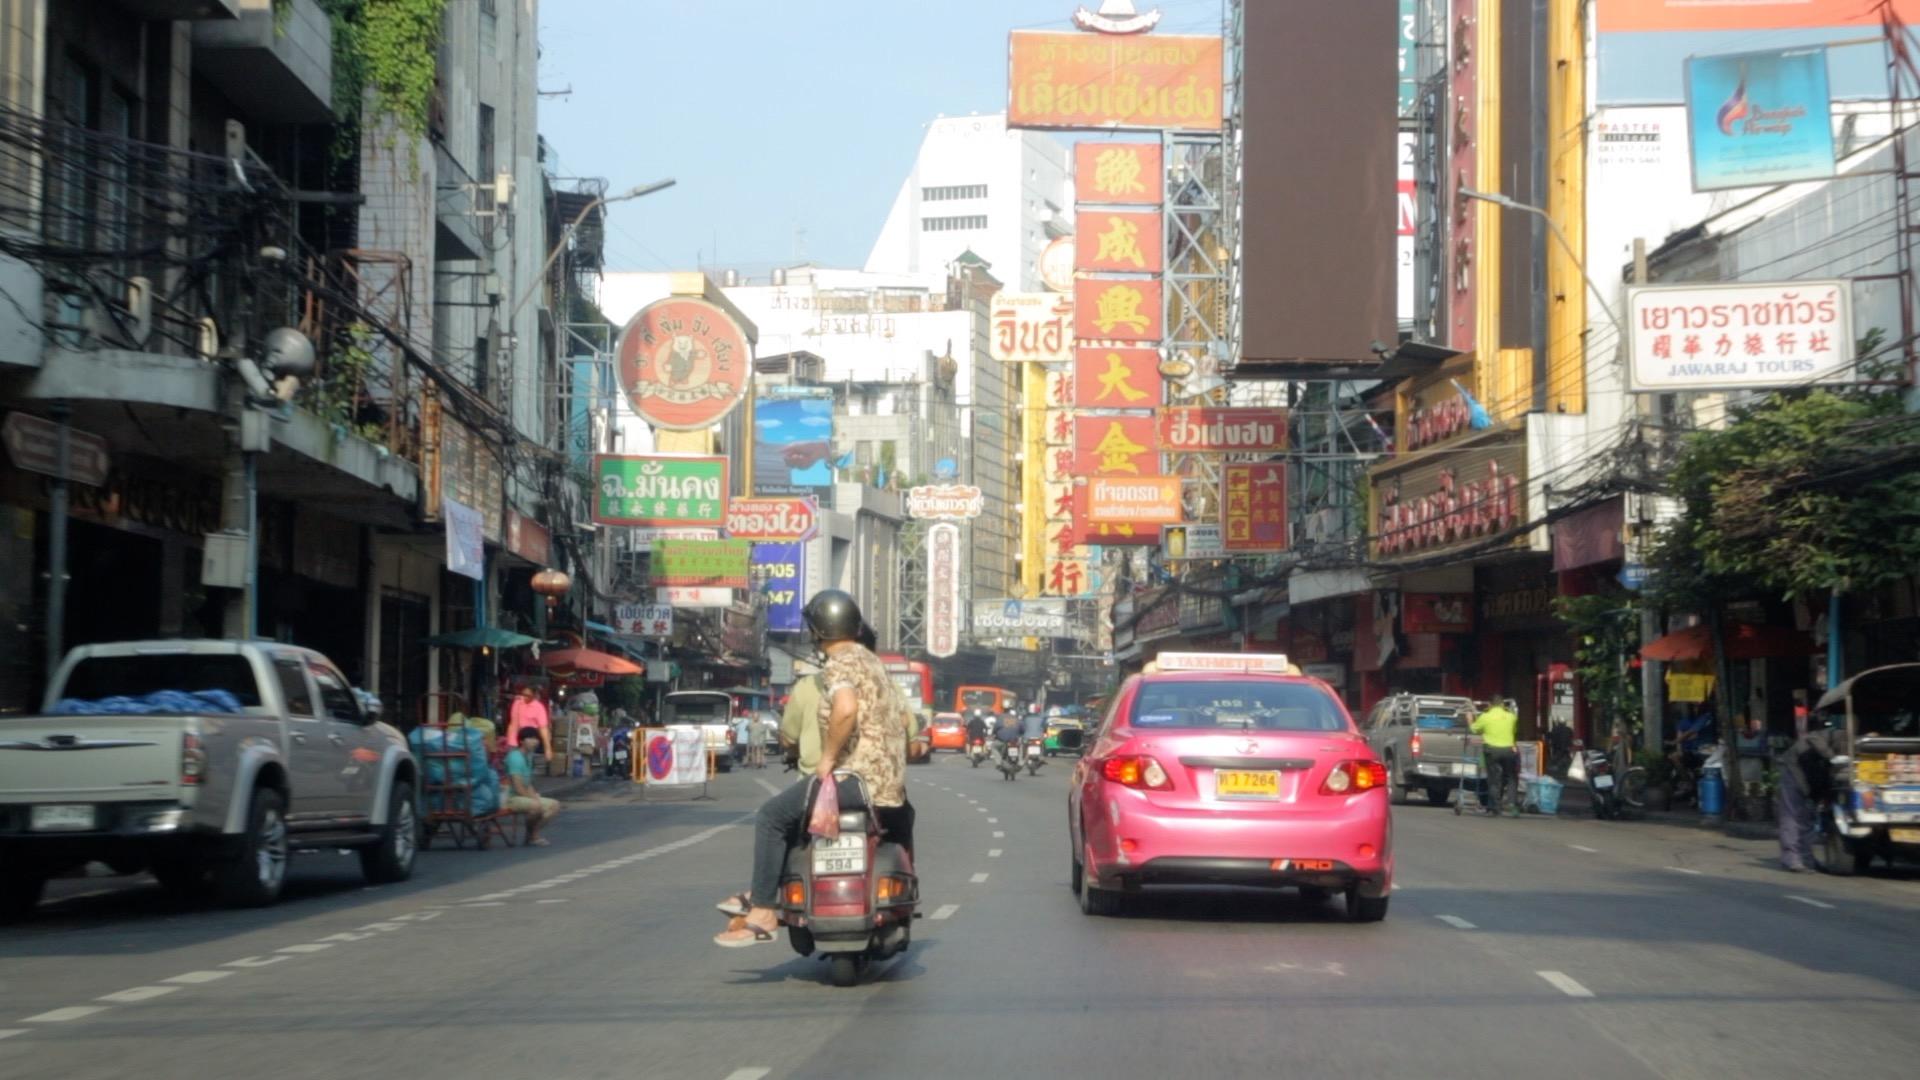 Street scene in Bangkok, Thailand. 2014